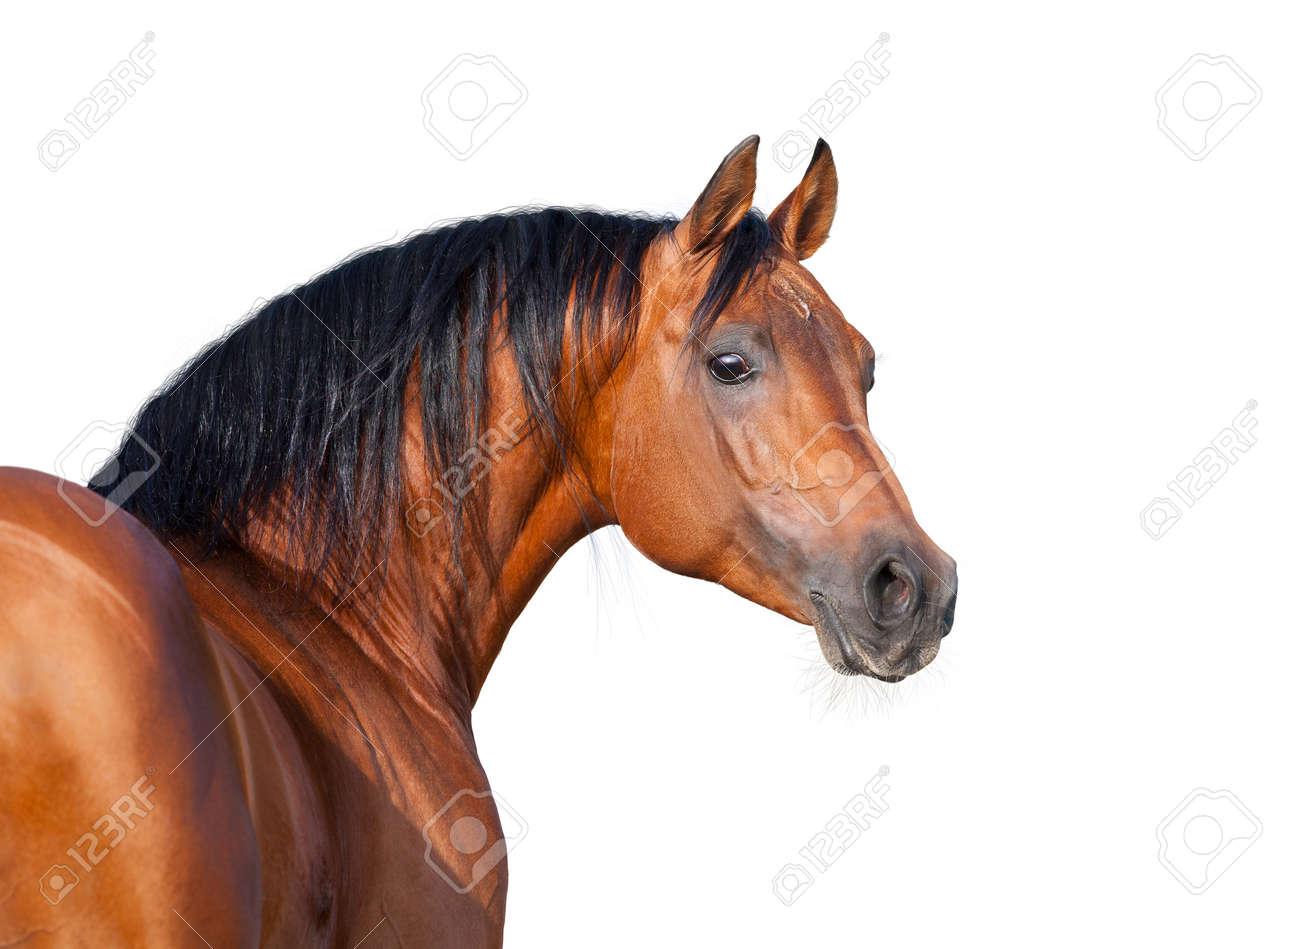 image cheval sur fond blanc